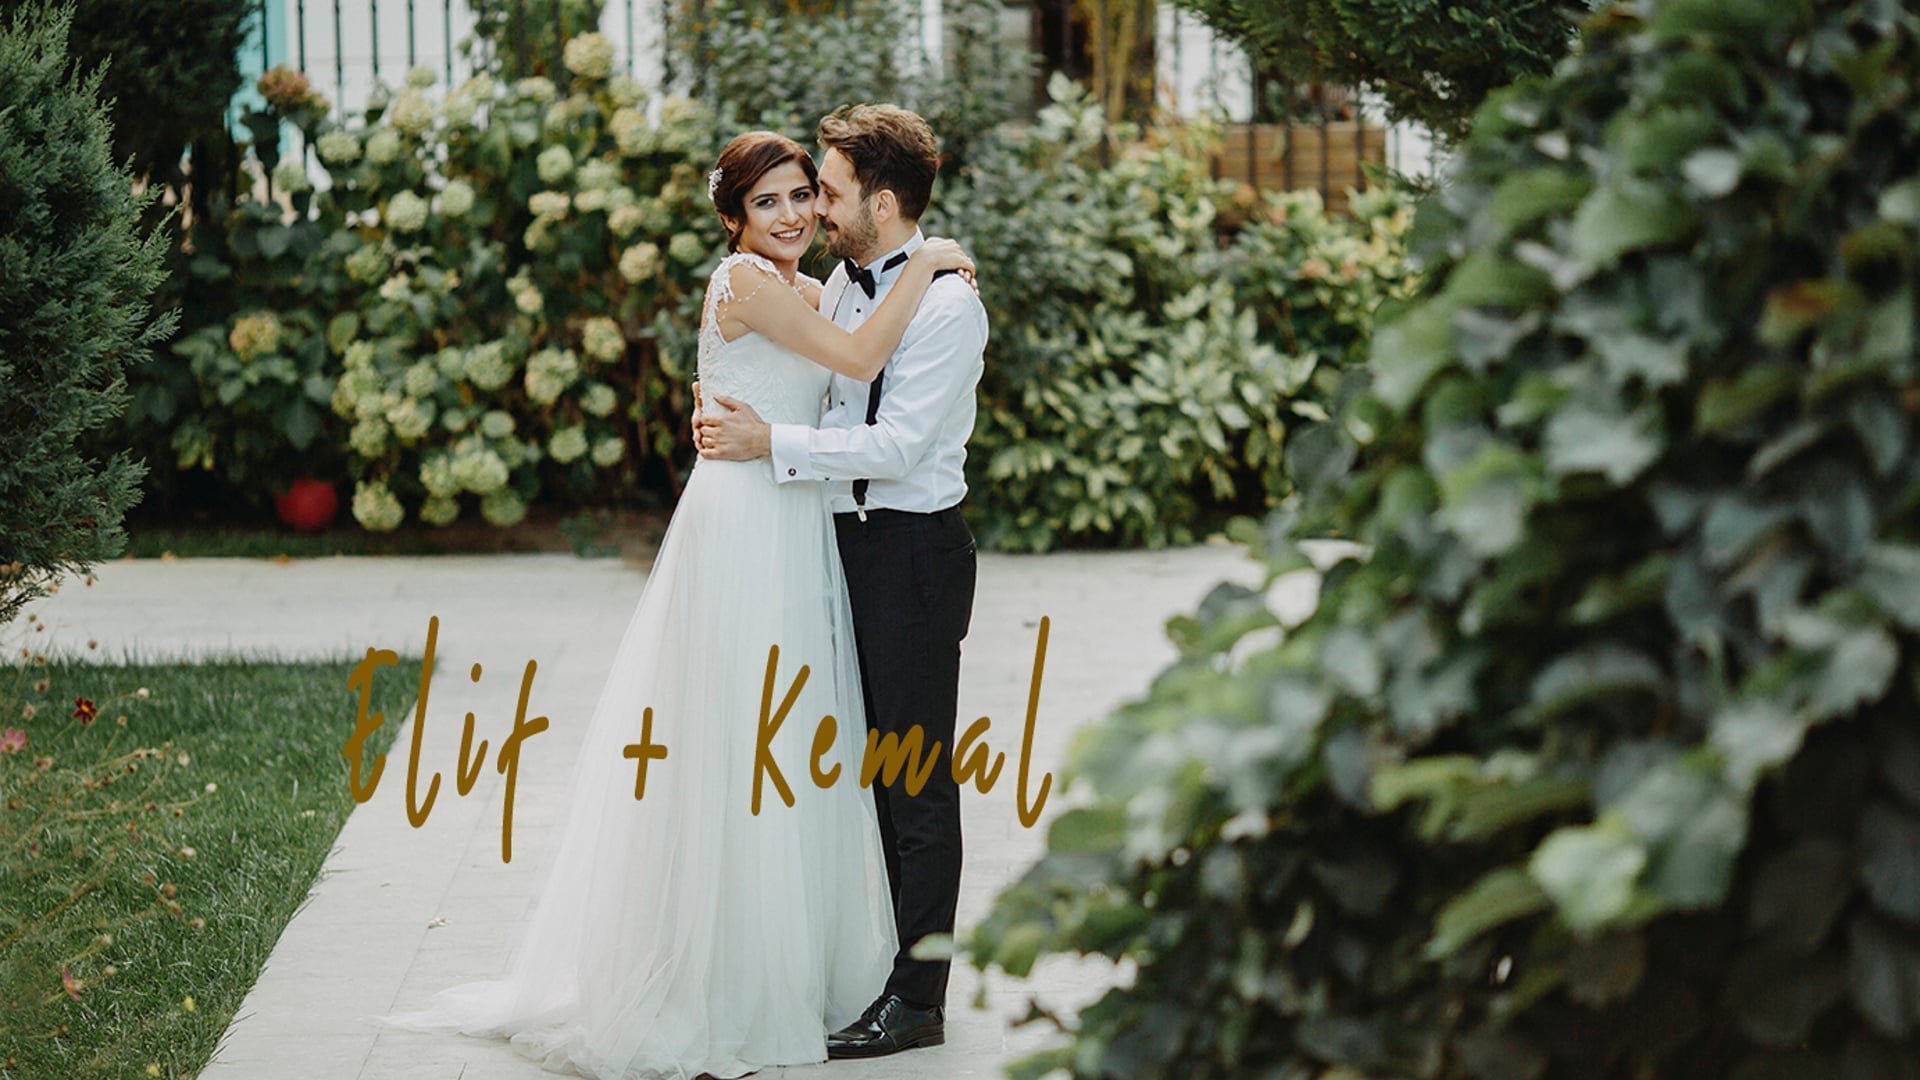 Elif + Kemal wedding Konya   Turkey